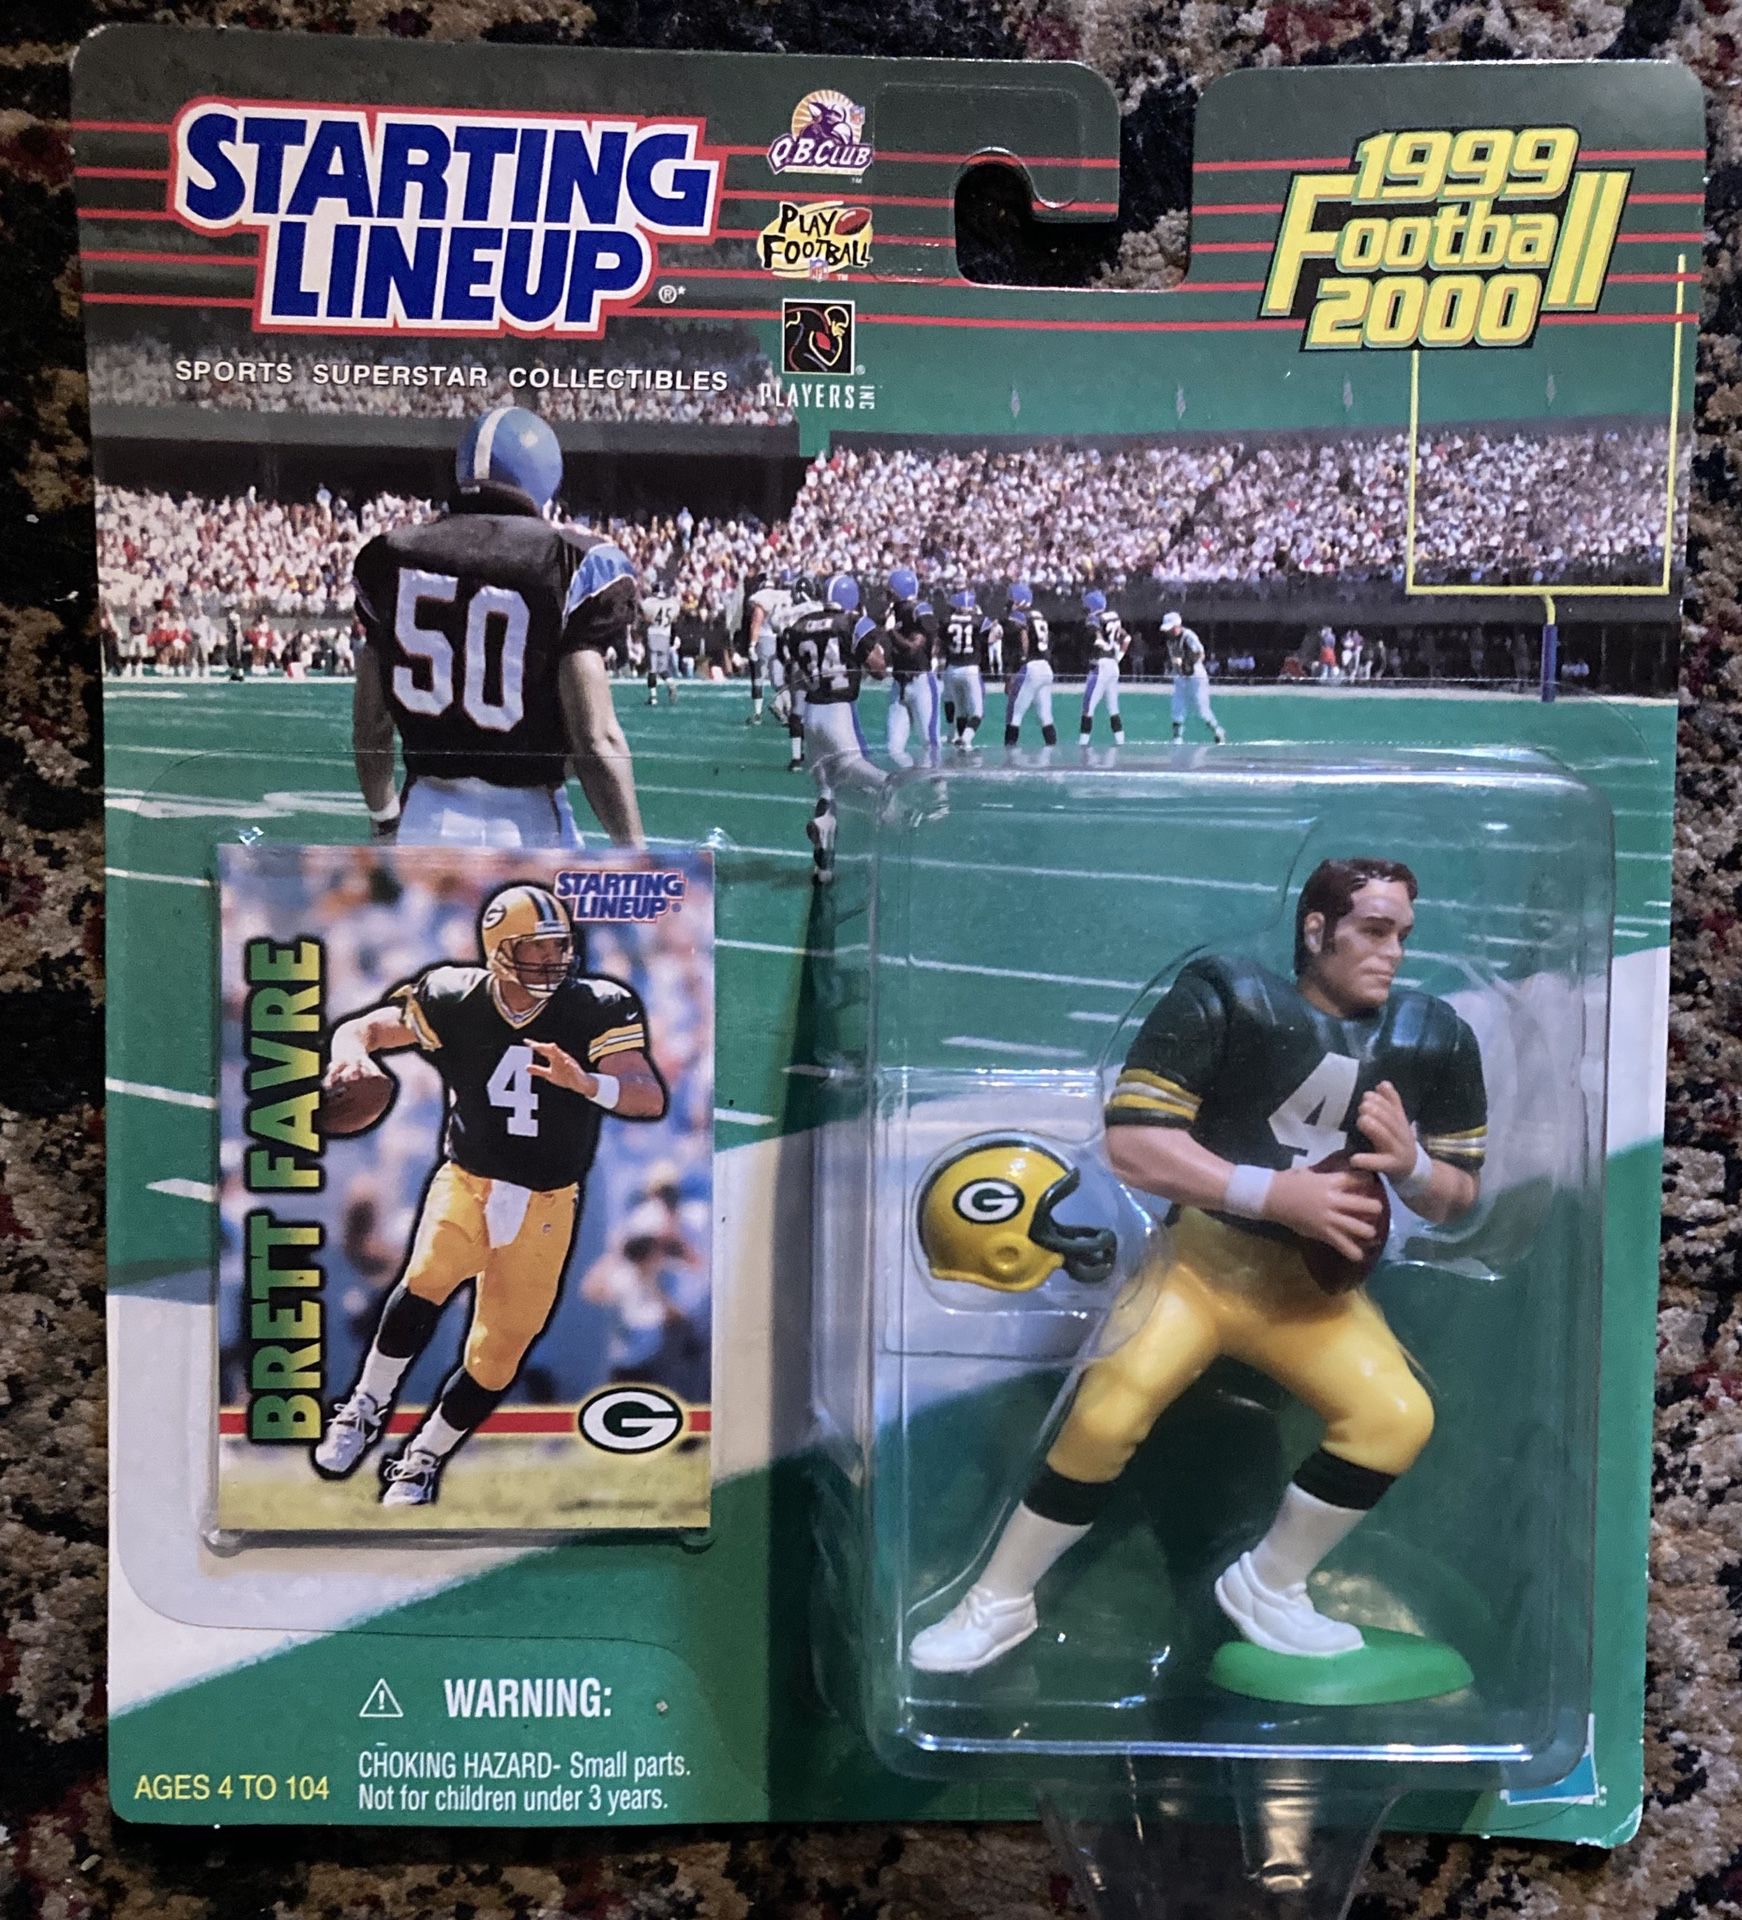 NFL starting lineup 1999 football Brett favre toy